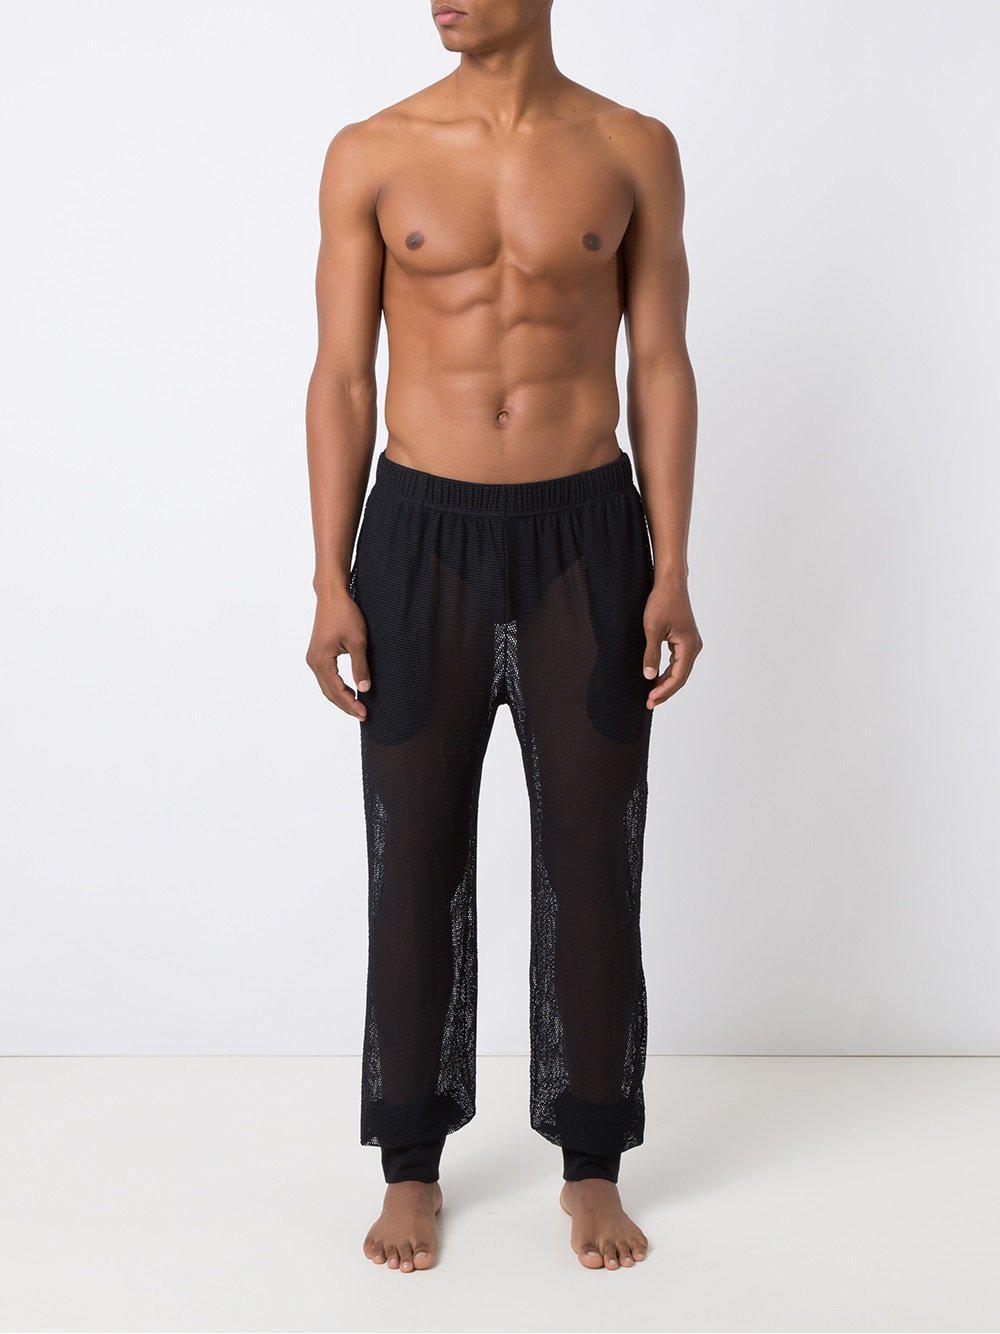 Amir Slama Mesh Trousers in Black for Men